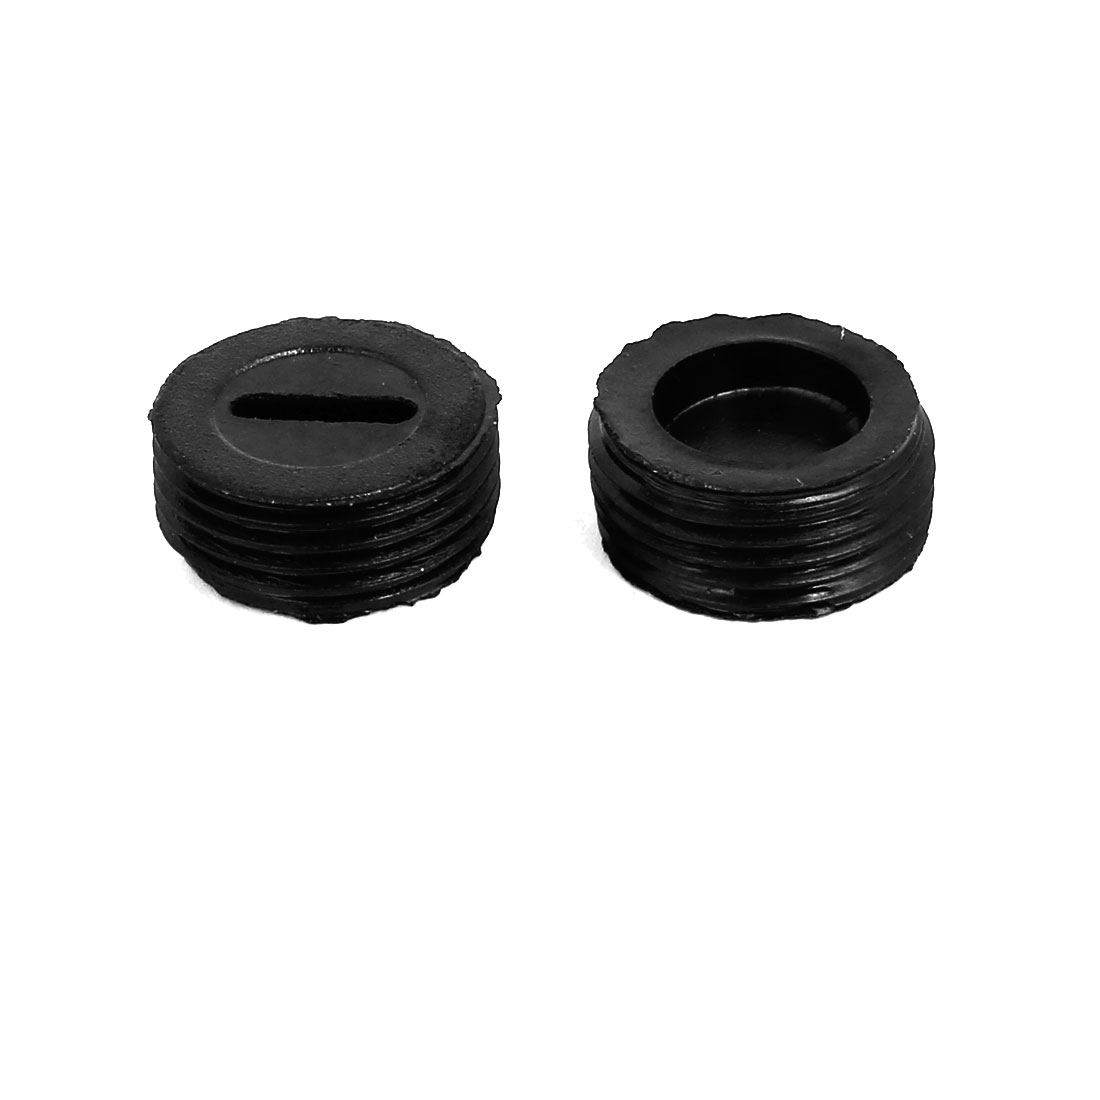 5pcs 13mm OD Male Thread Plastic Motor Carbon Brush Holder Cap Cover Black - image 1 of 2